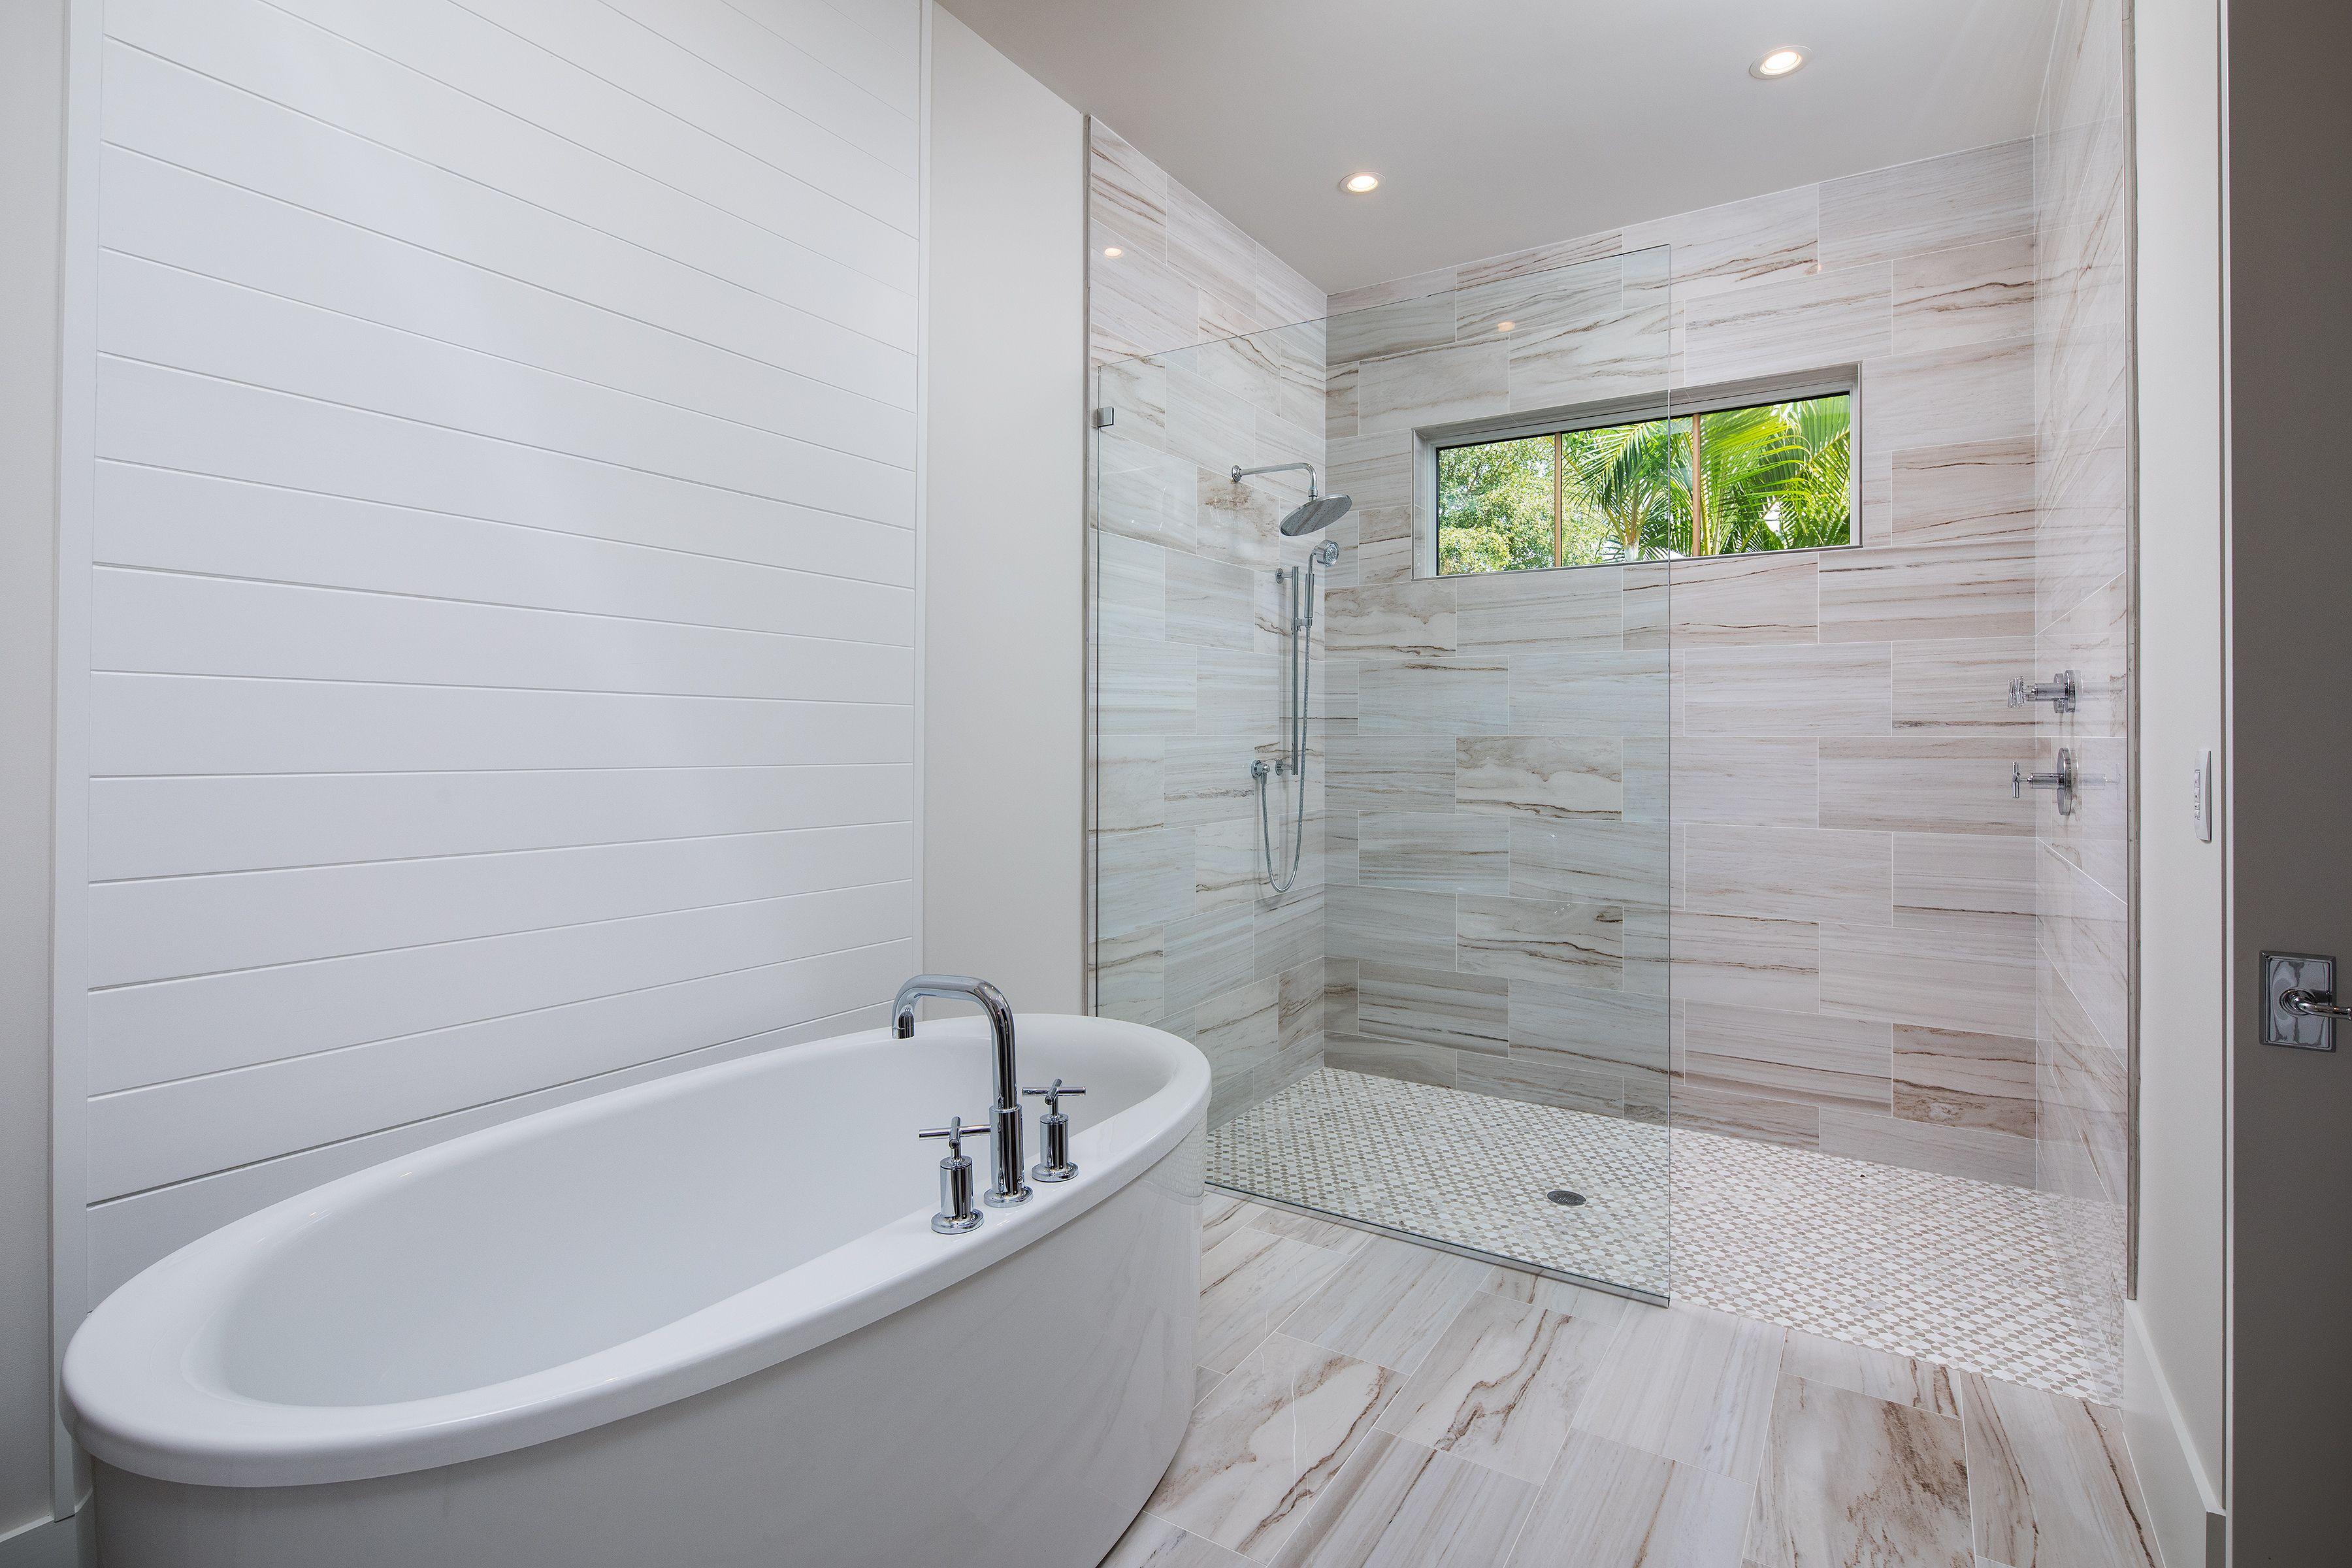 Frameless Shower Doors With Images Seamless Shower Door Glass